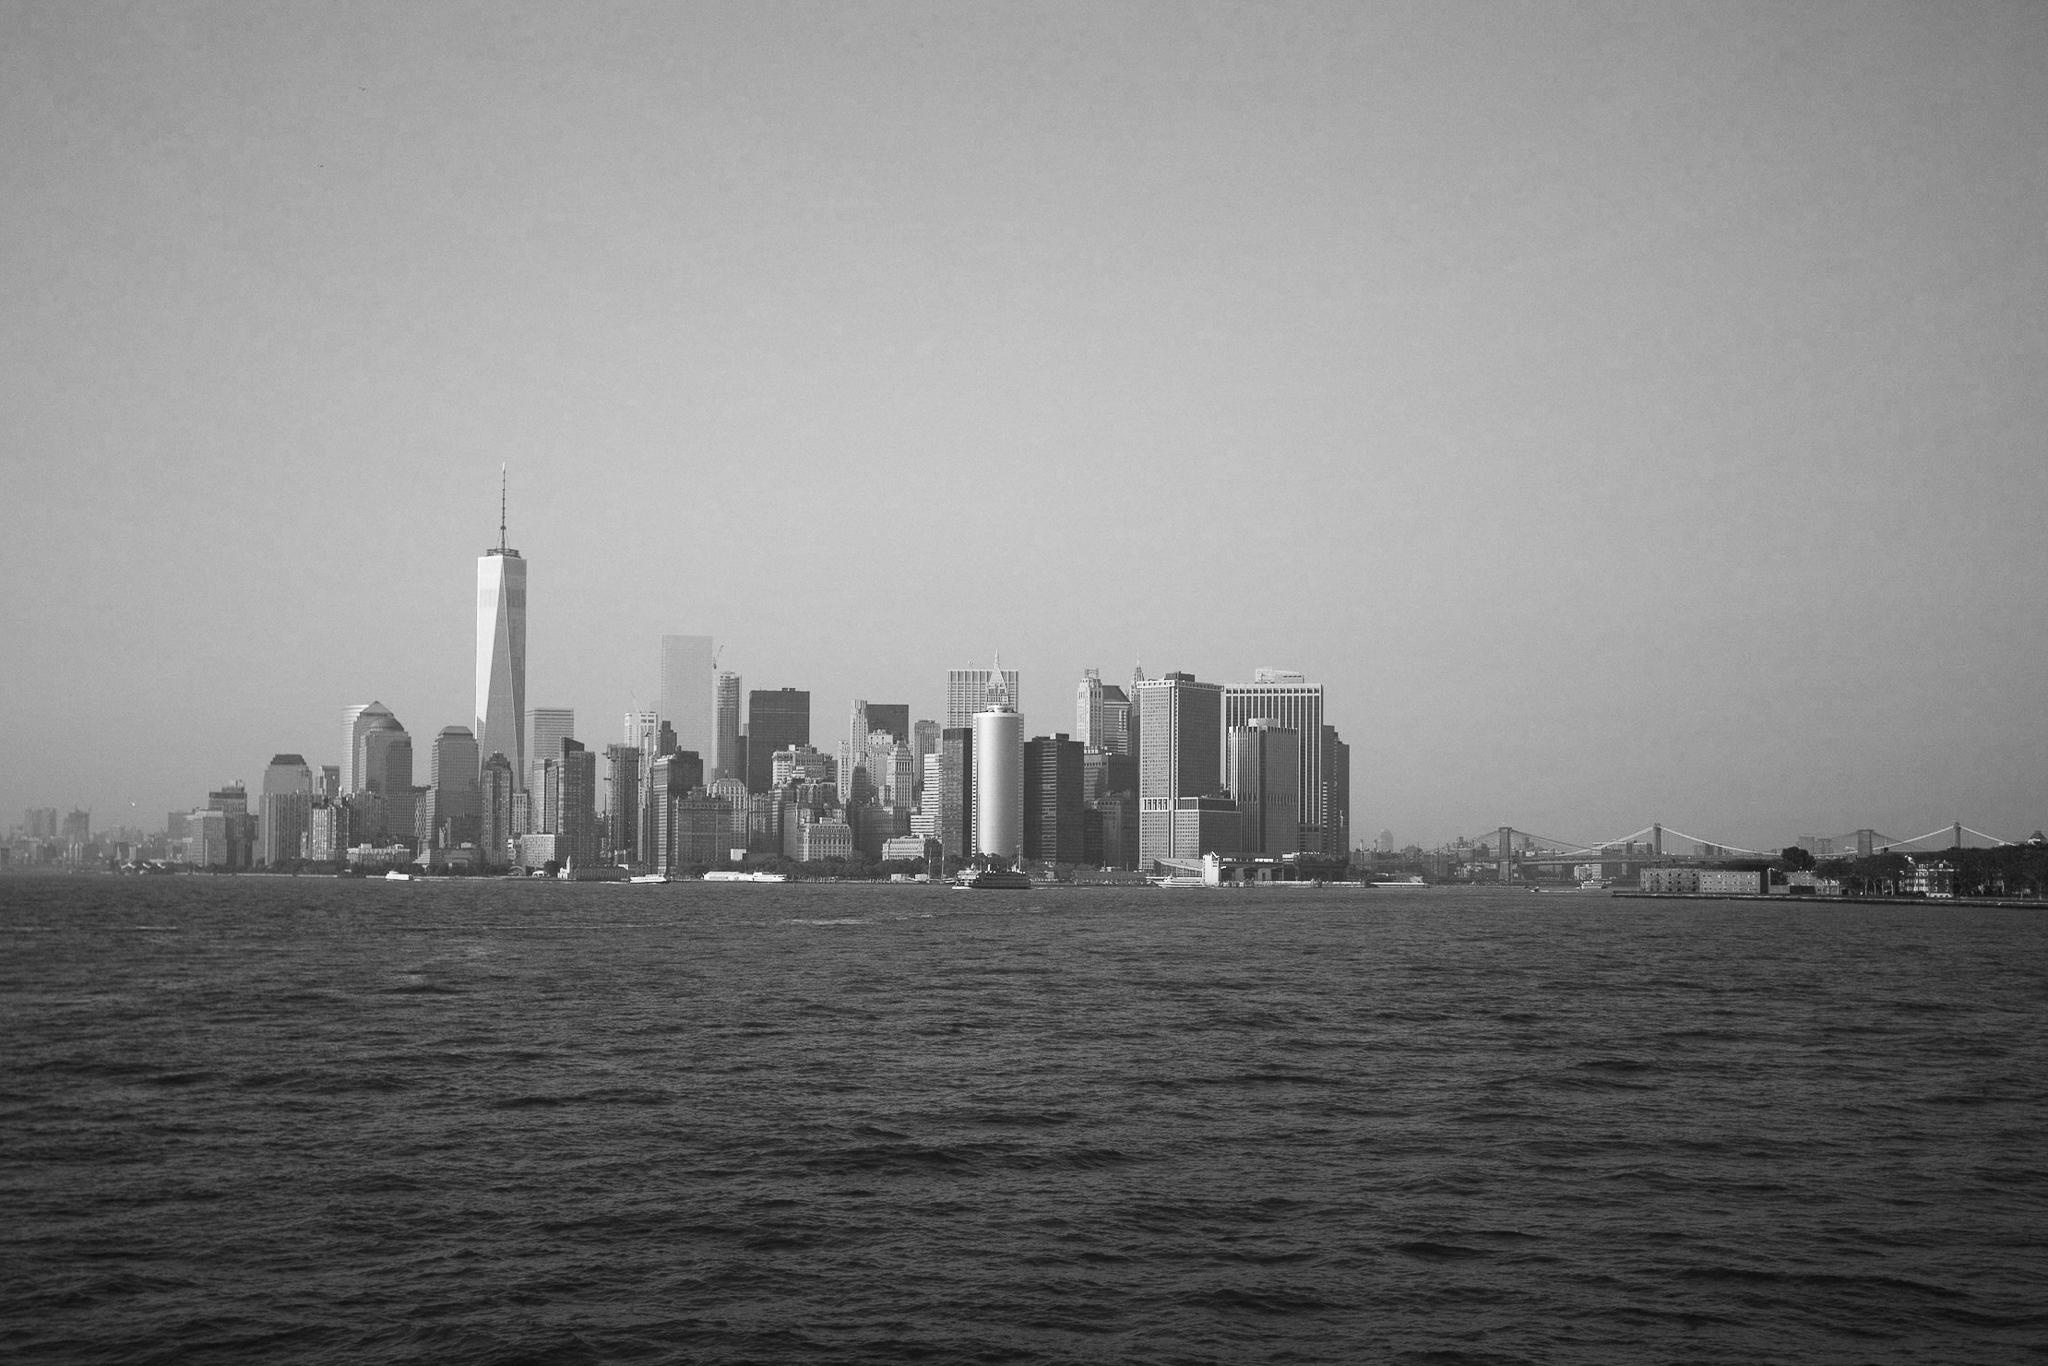 2015-05-14-NYC-2001.jpg